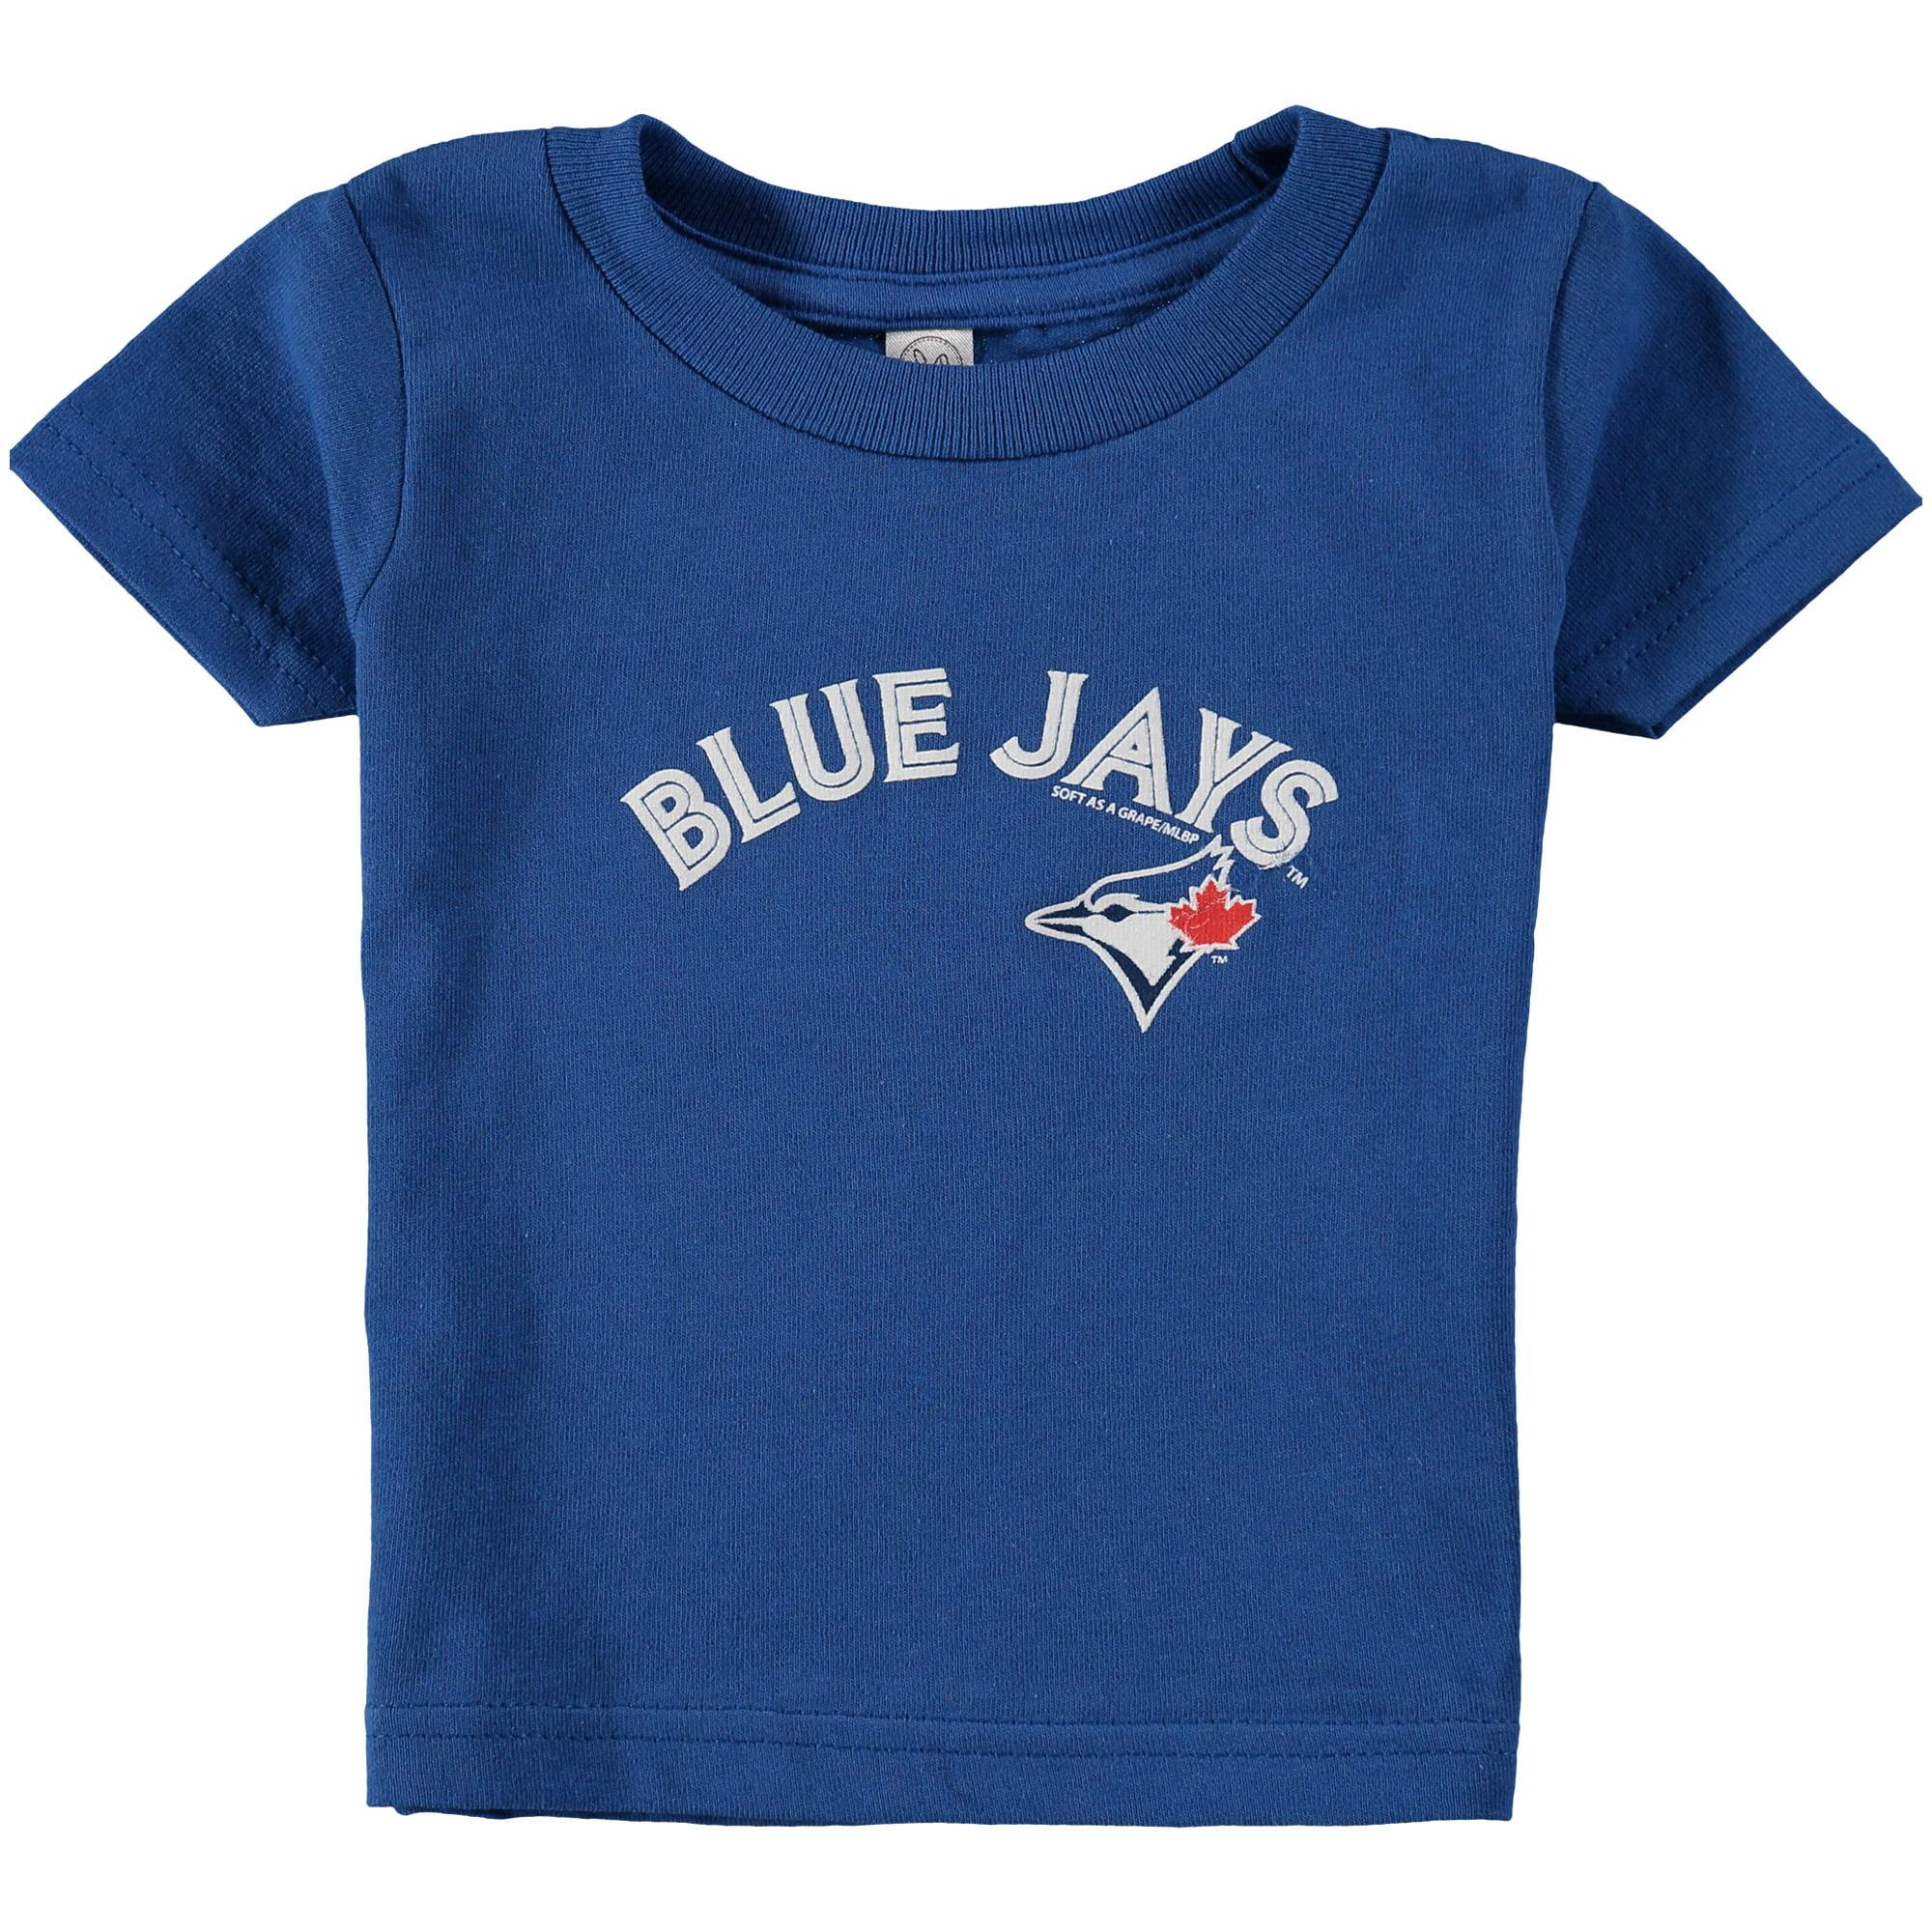 Toronto Blue Jays Soft as a Grape Infant Wordmark T-Shirt - Royal